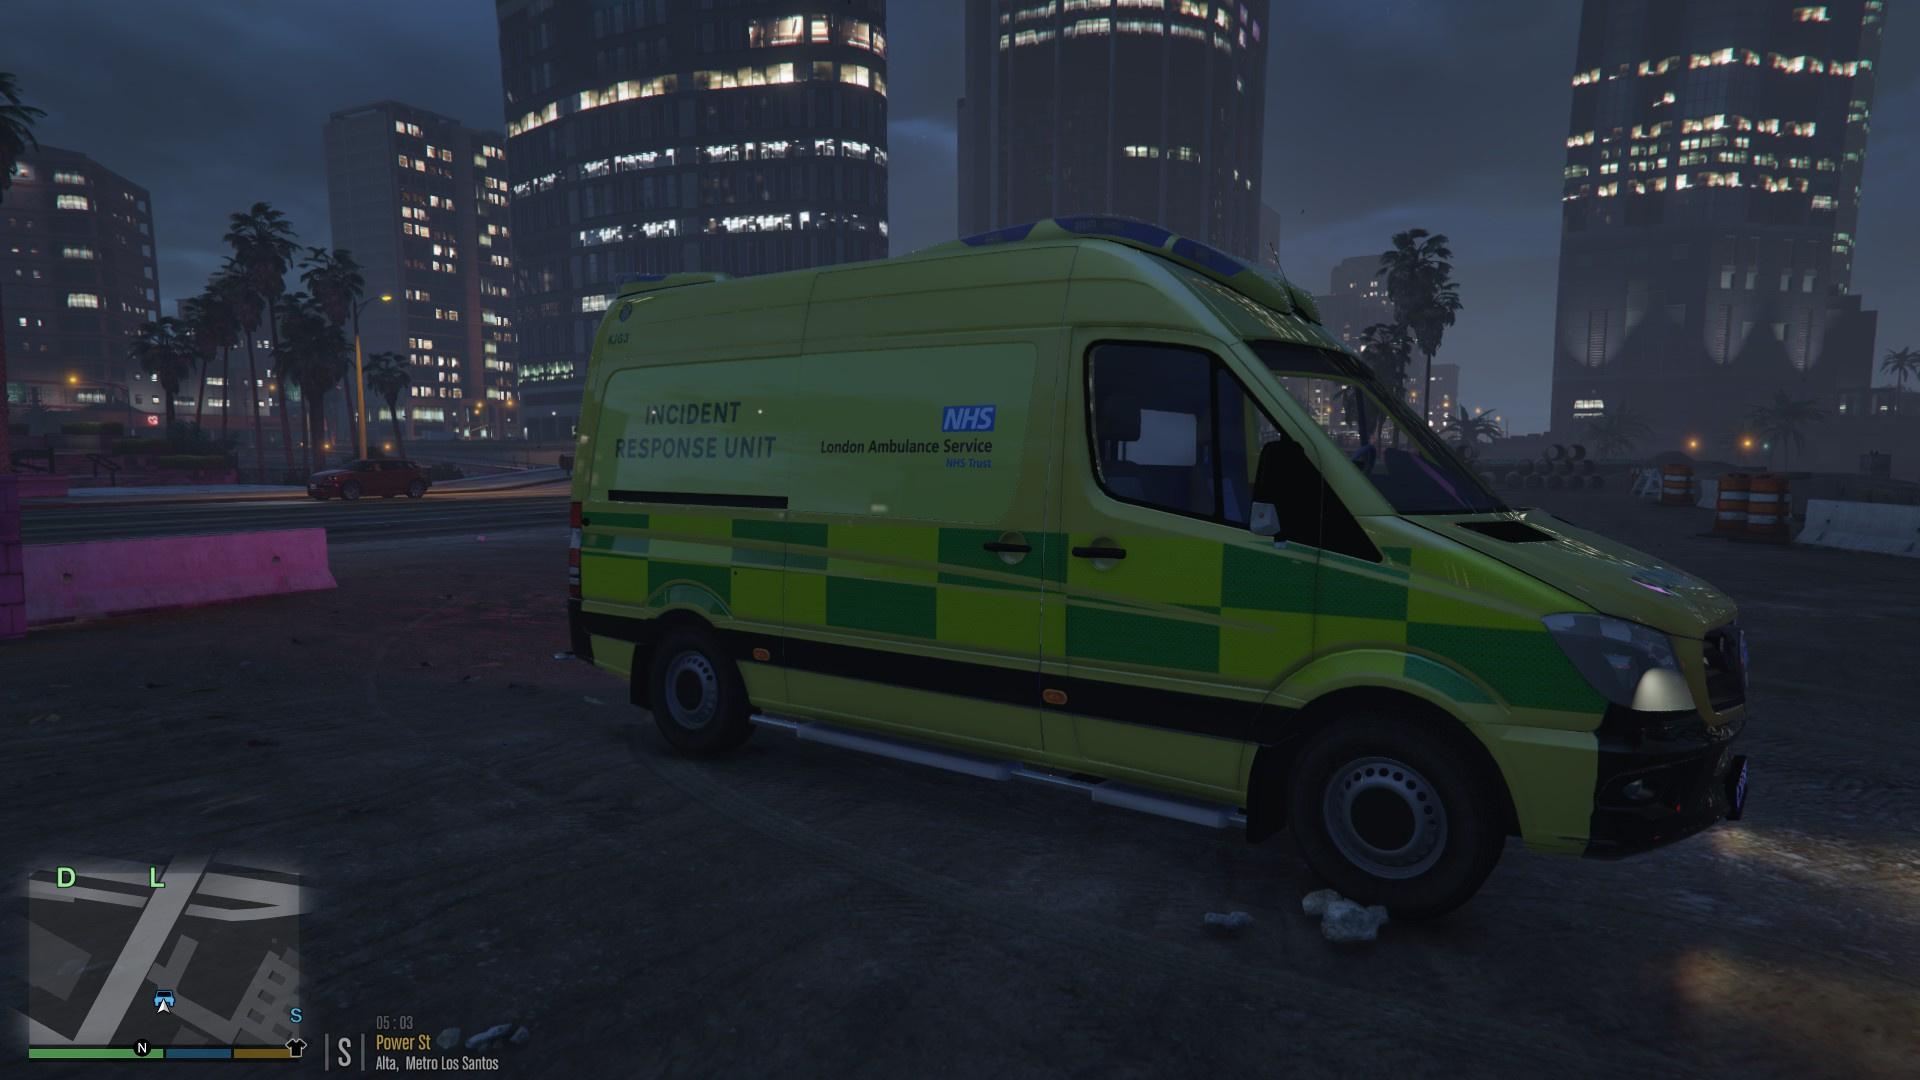 London ambulance service mercedes benz sprinter incident for Service for mercedes benz